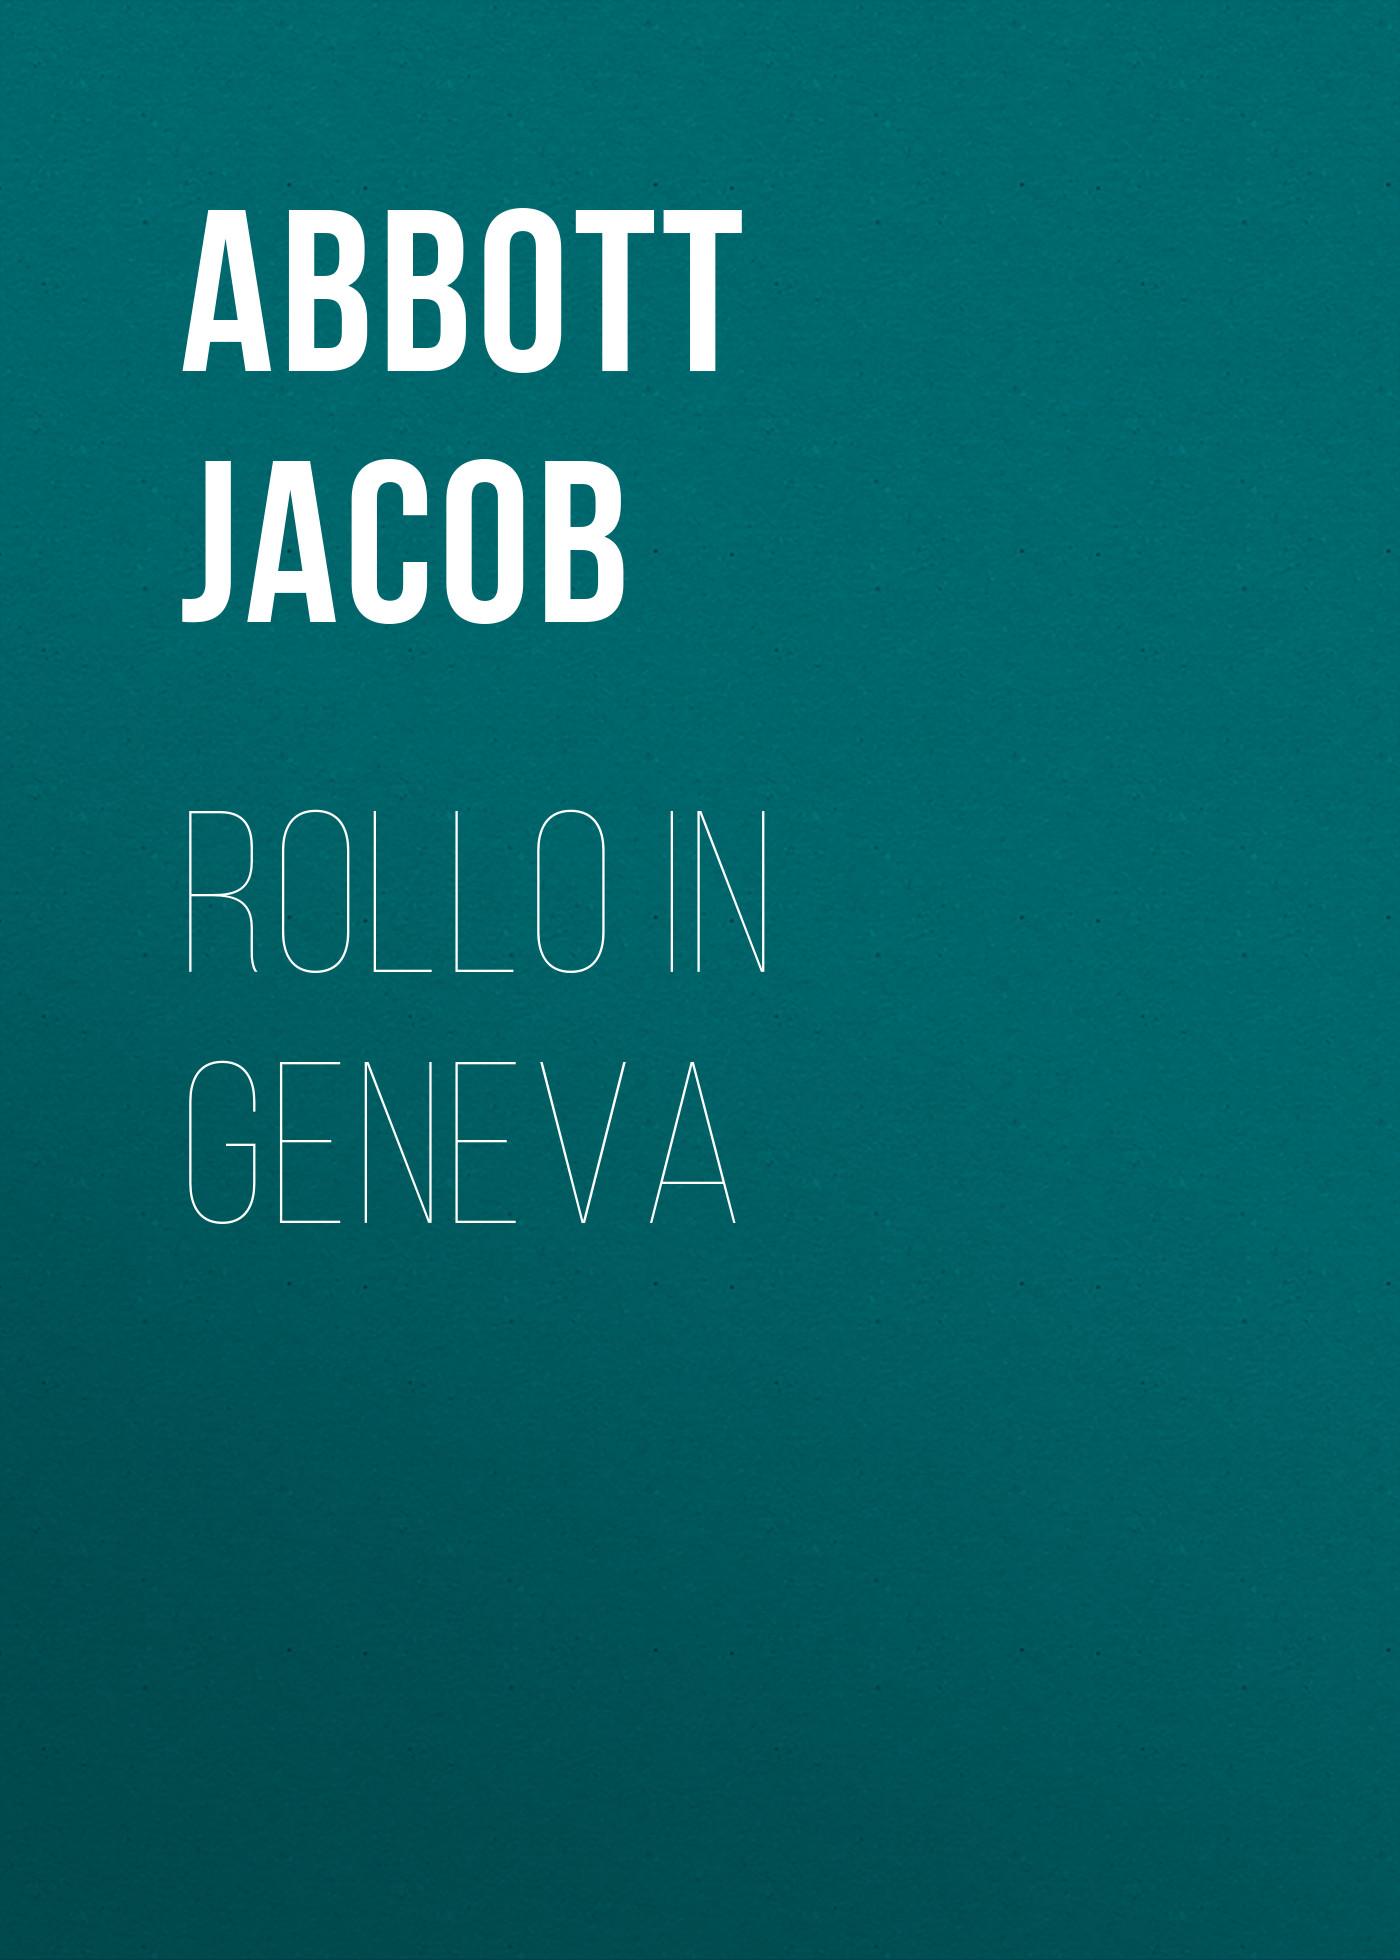 Abbott Jacob Rollo in Geneva abbott jacob rollo on the rhine